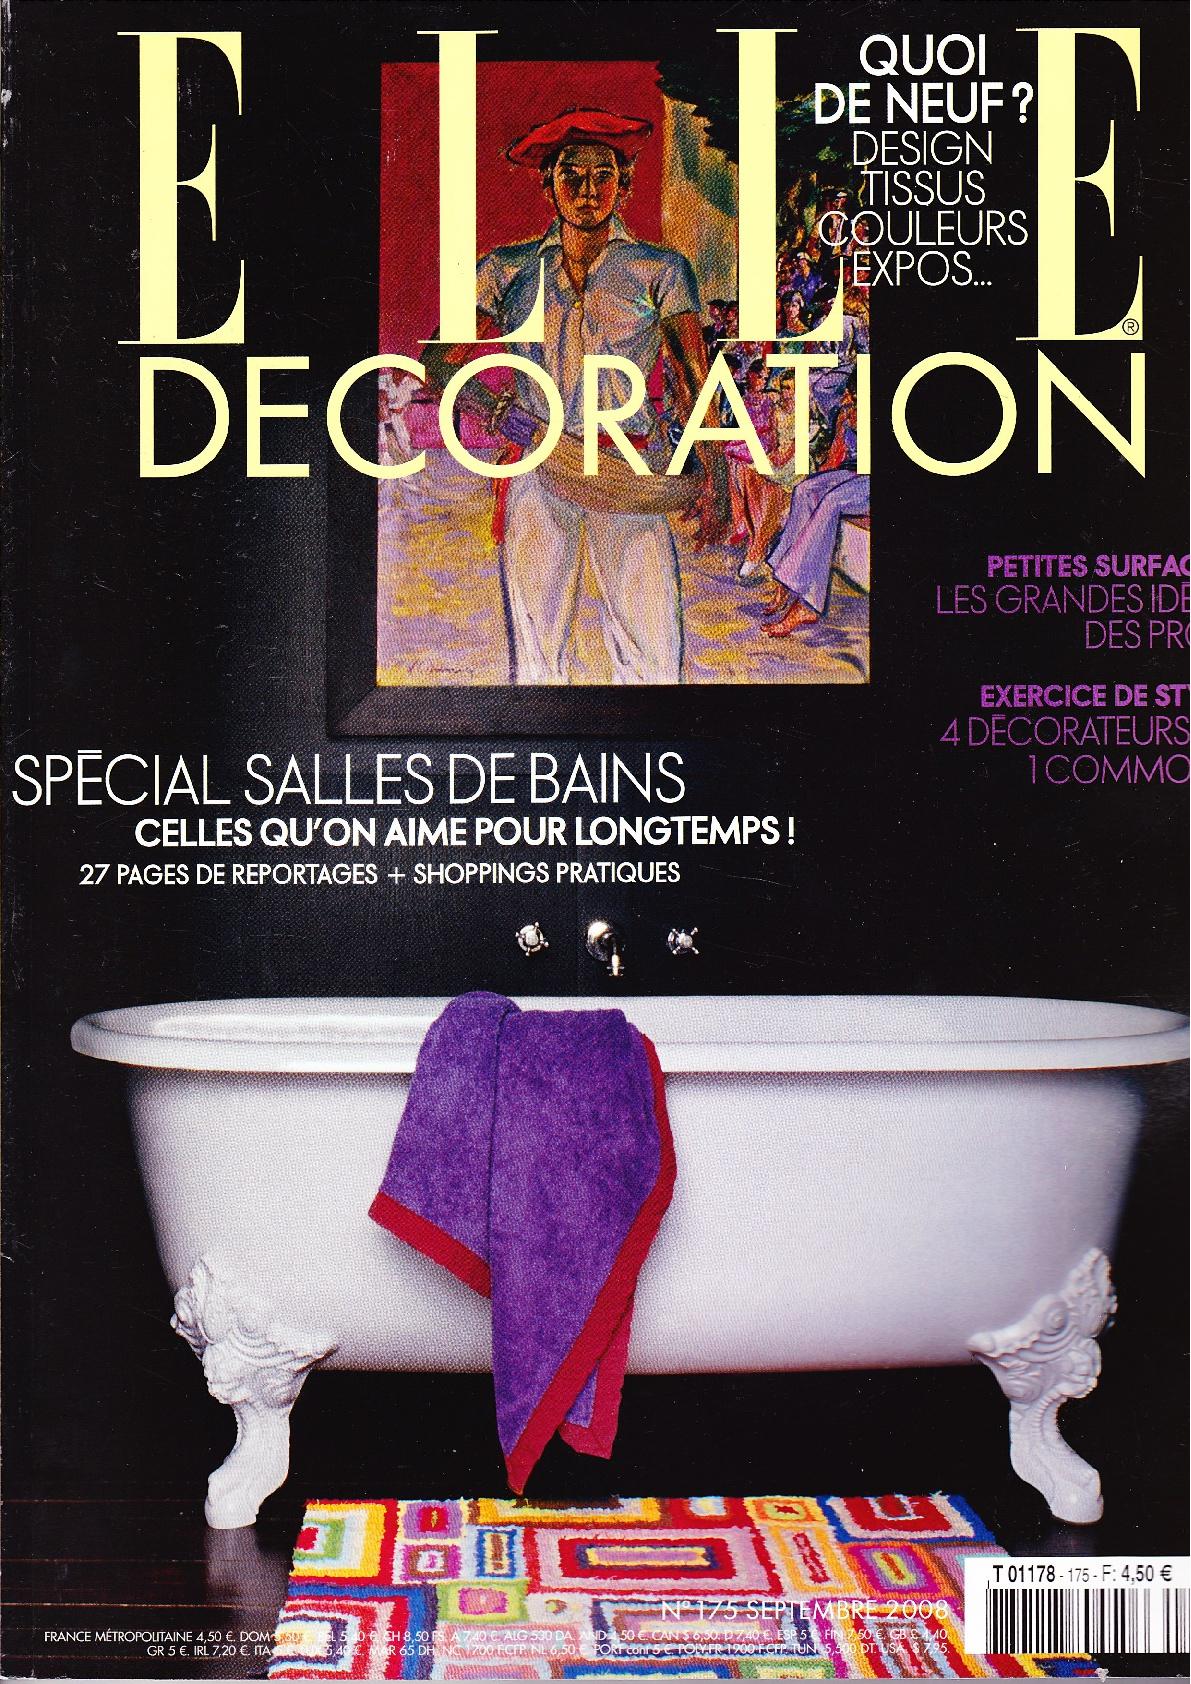 Elle Decoration Sept 2008 1-001